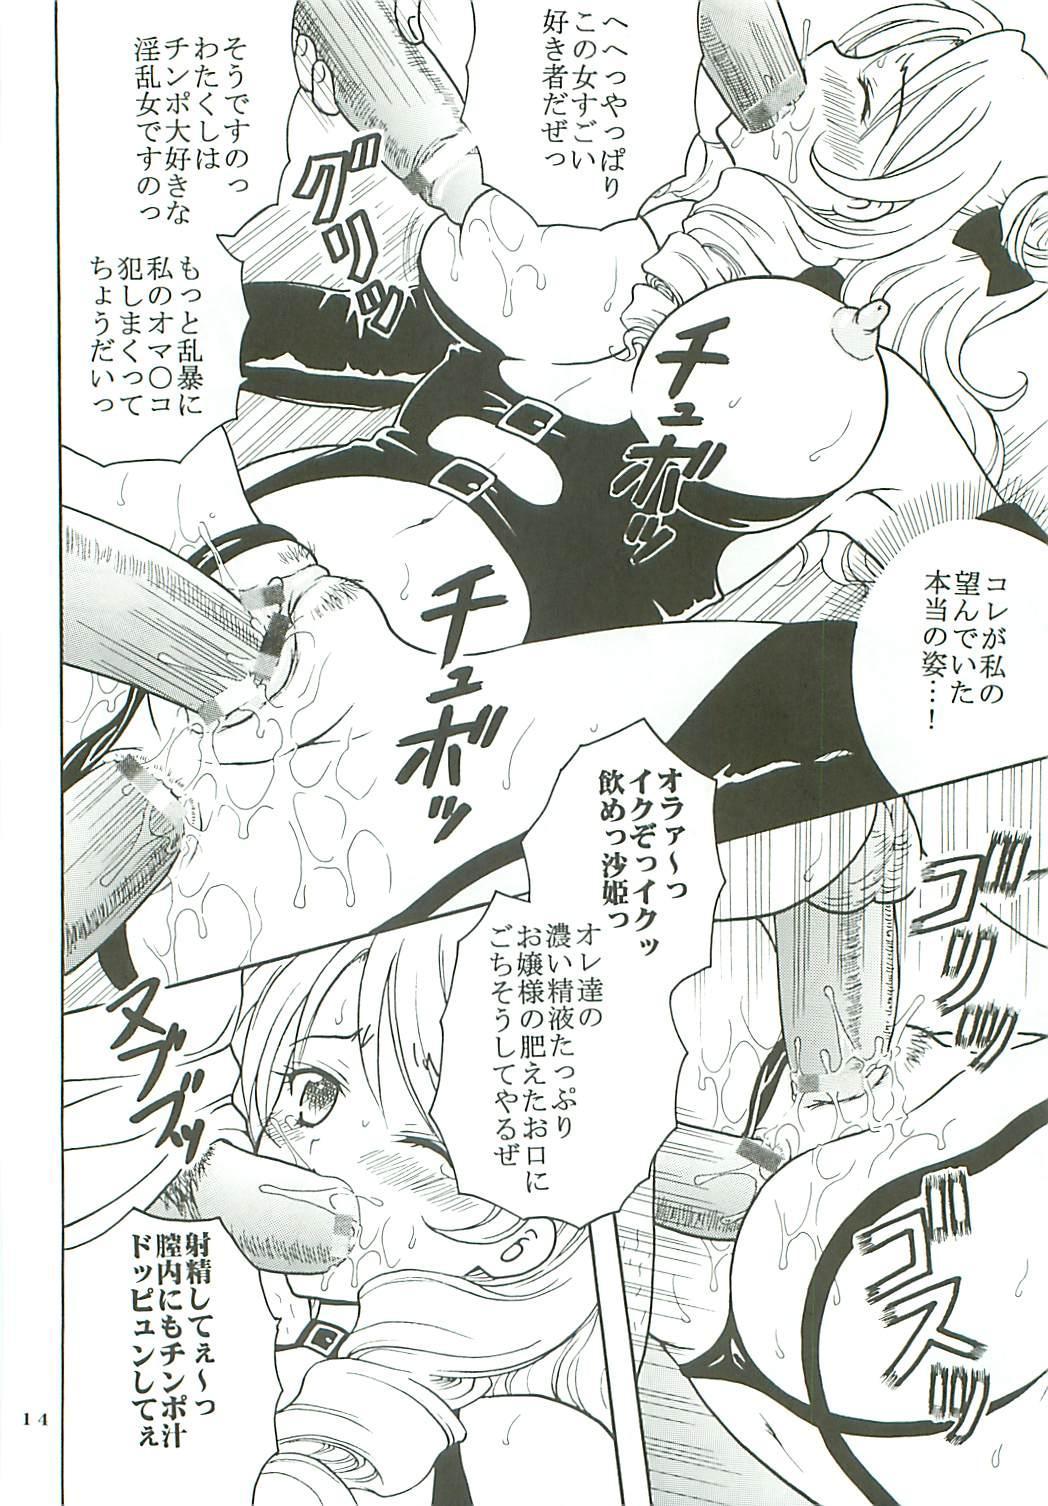 ToLOVE Ryu Vol. 7 14